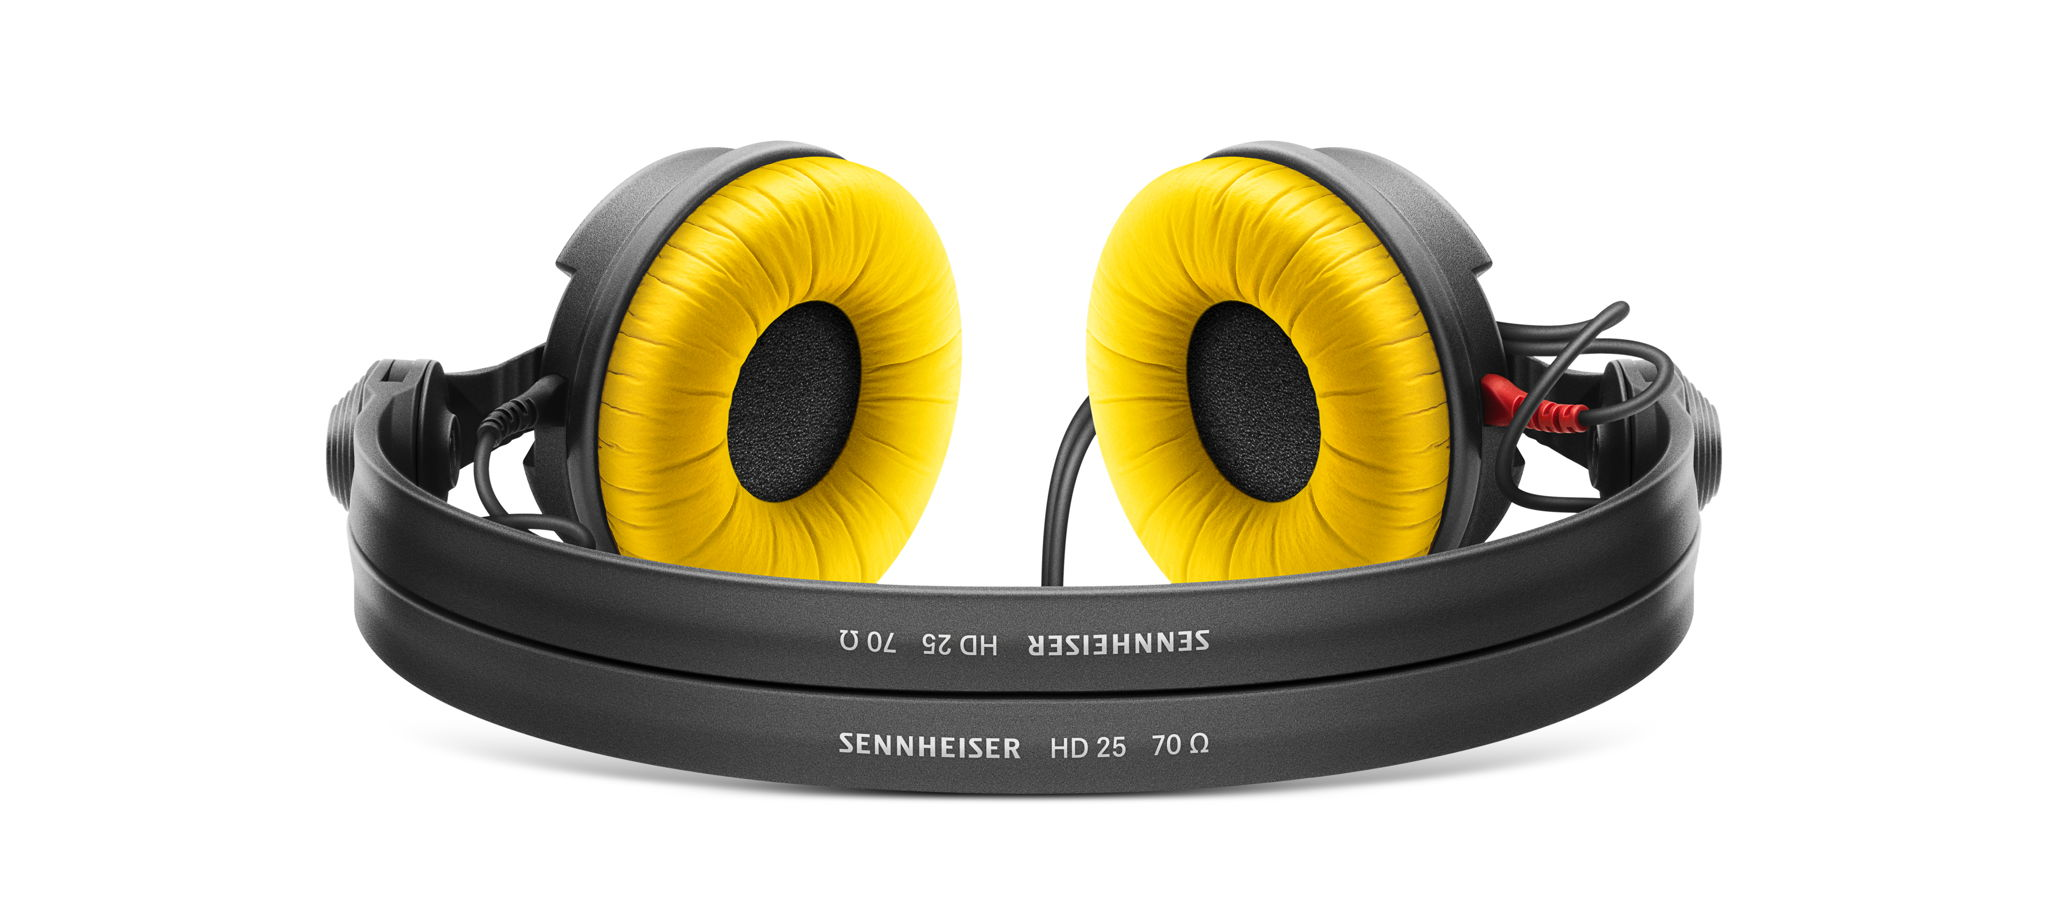 Sennheiser HD 25 headphone limited edition